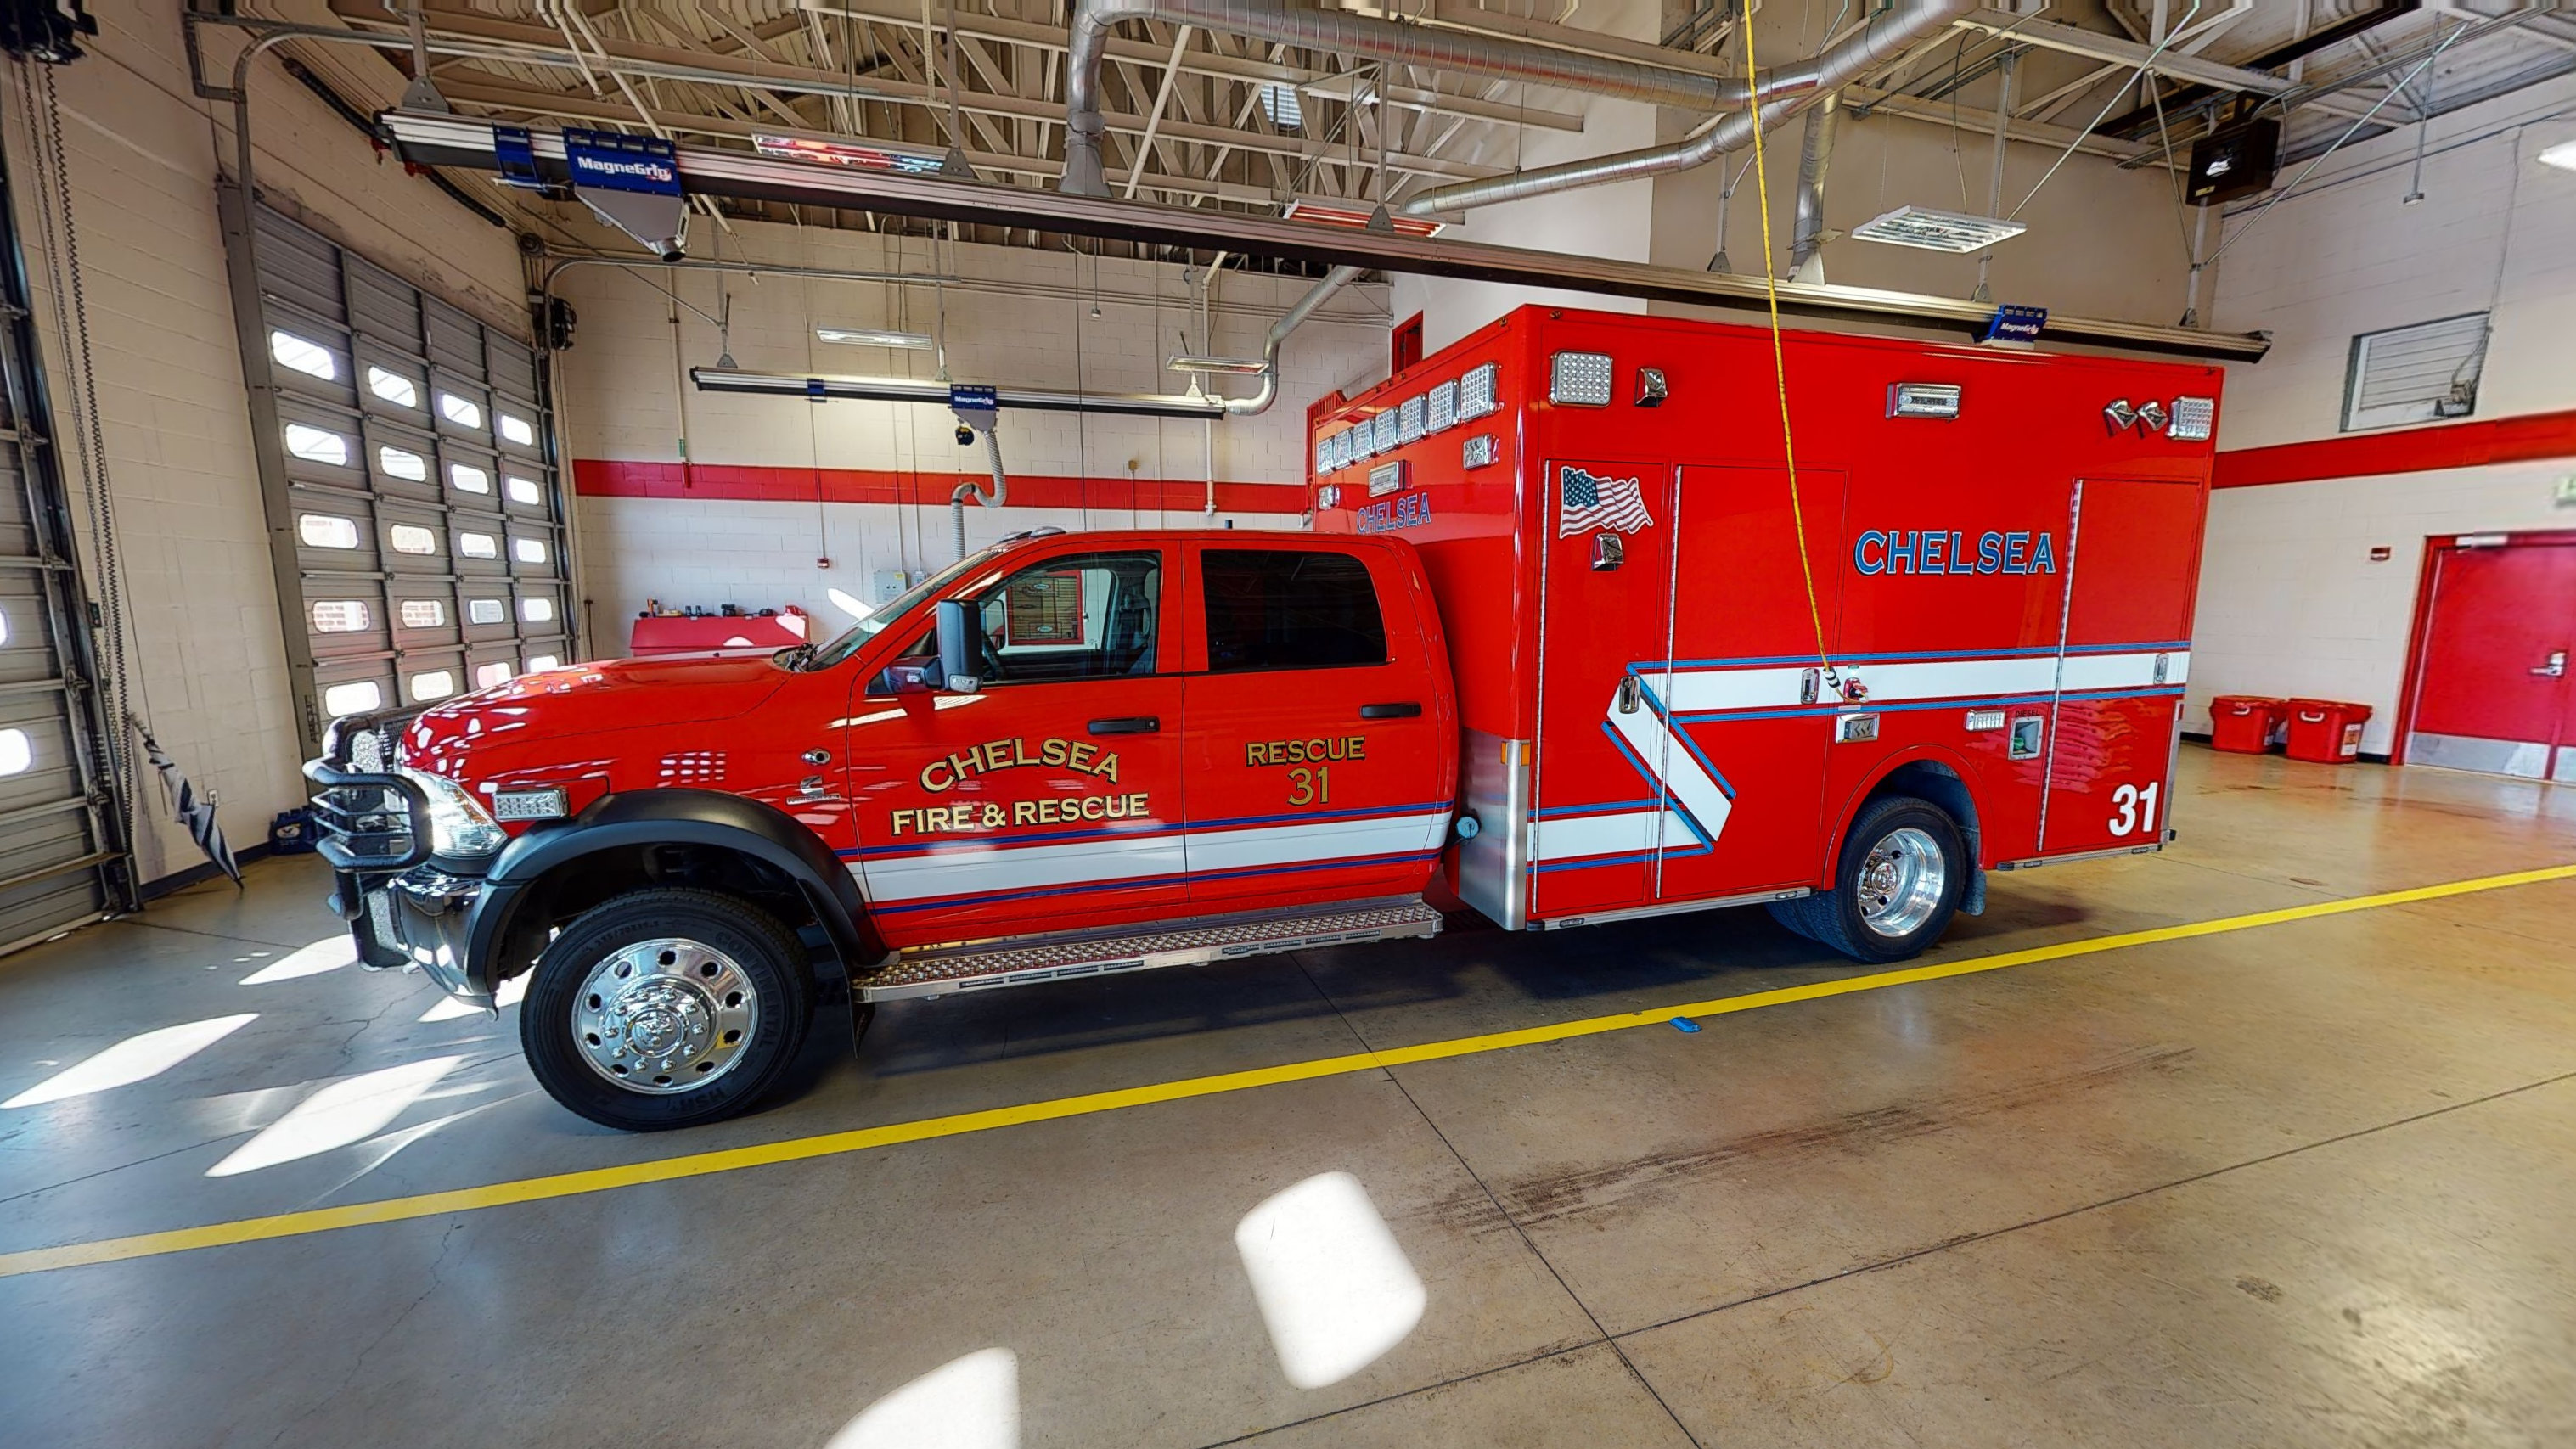 2_Chelsea-Fire-Rescue-Demers-151-12092020_163720